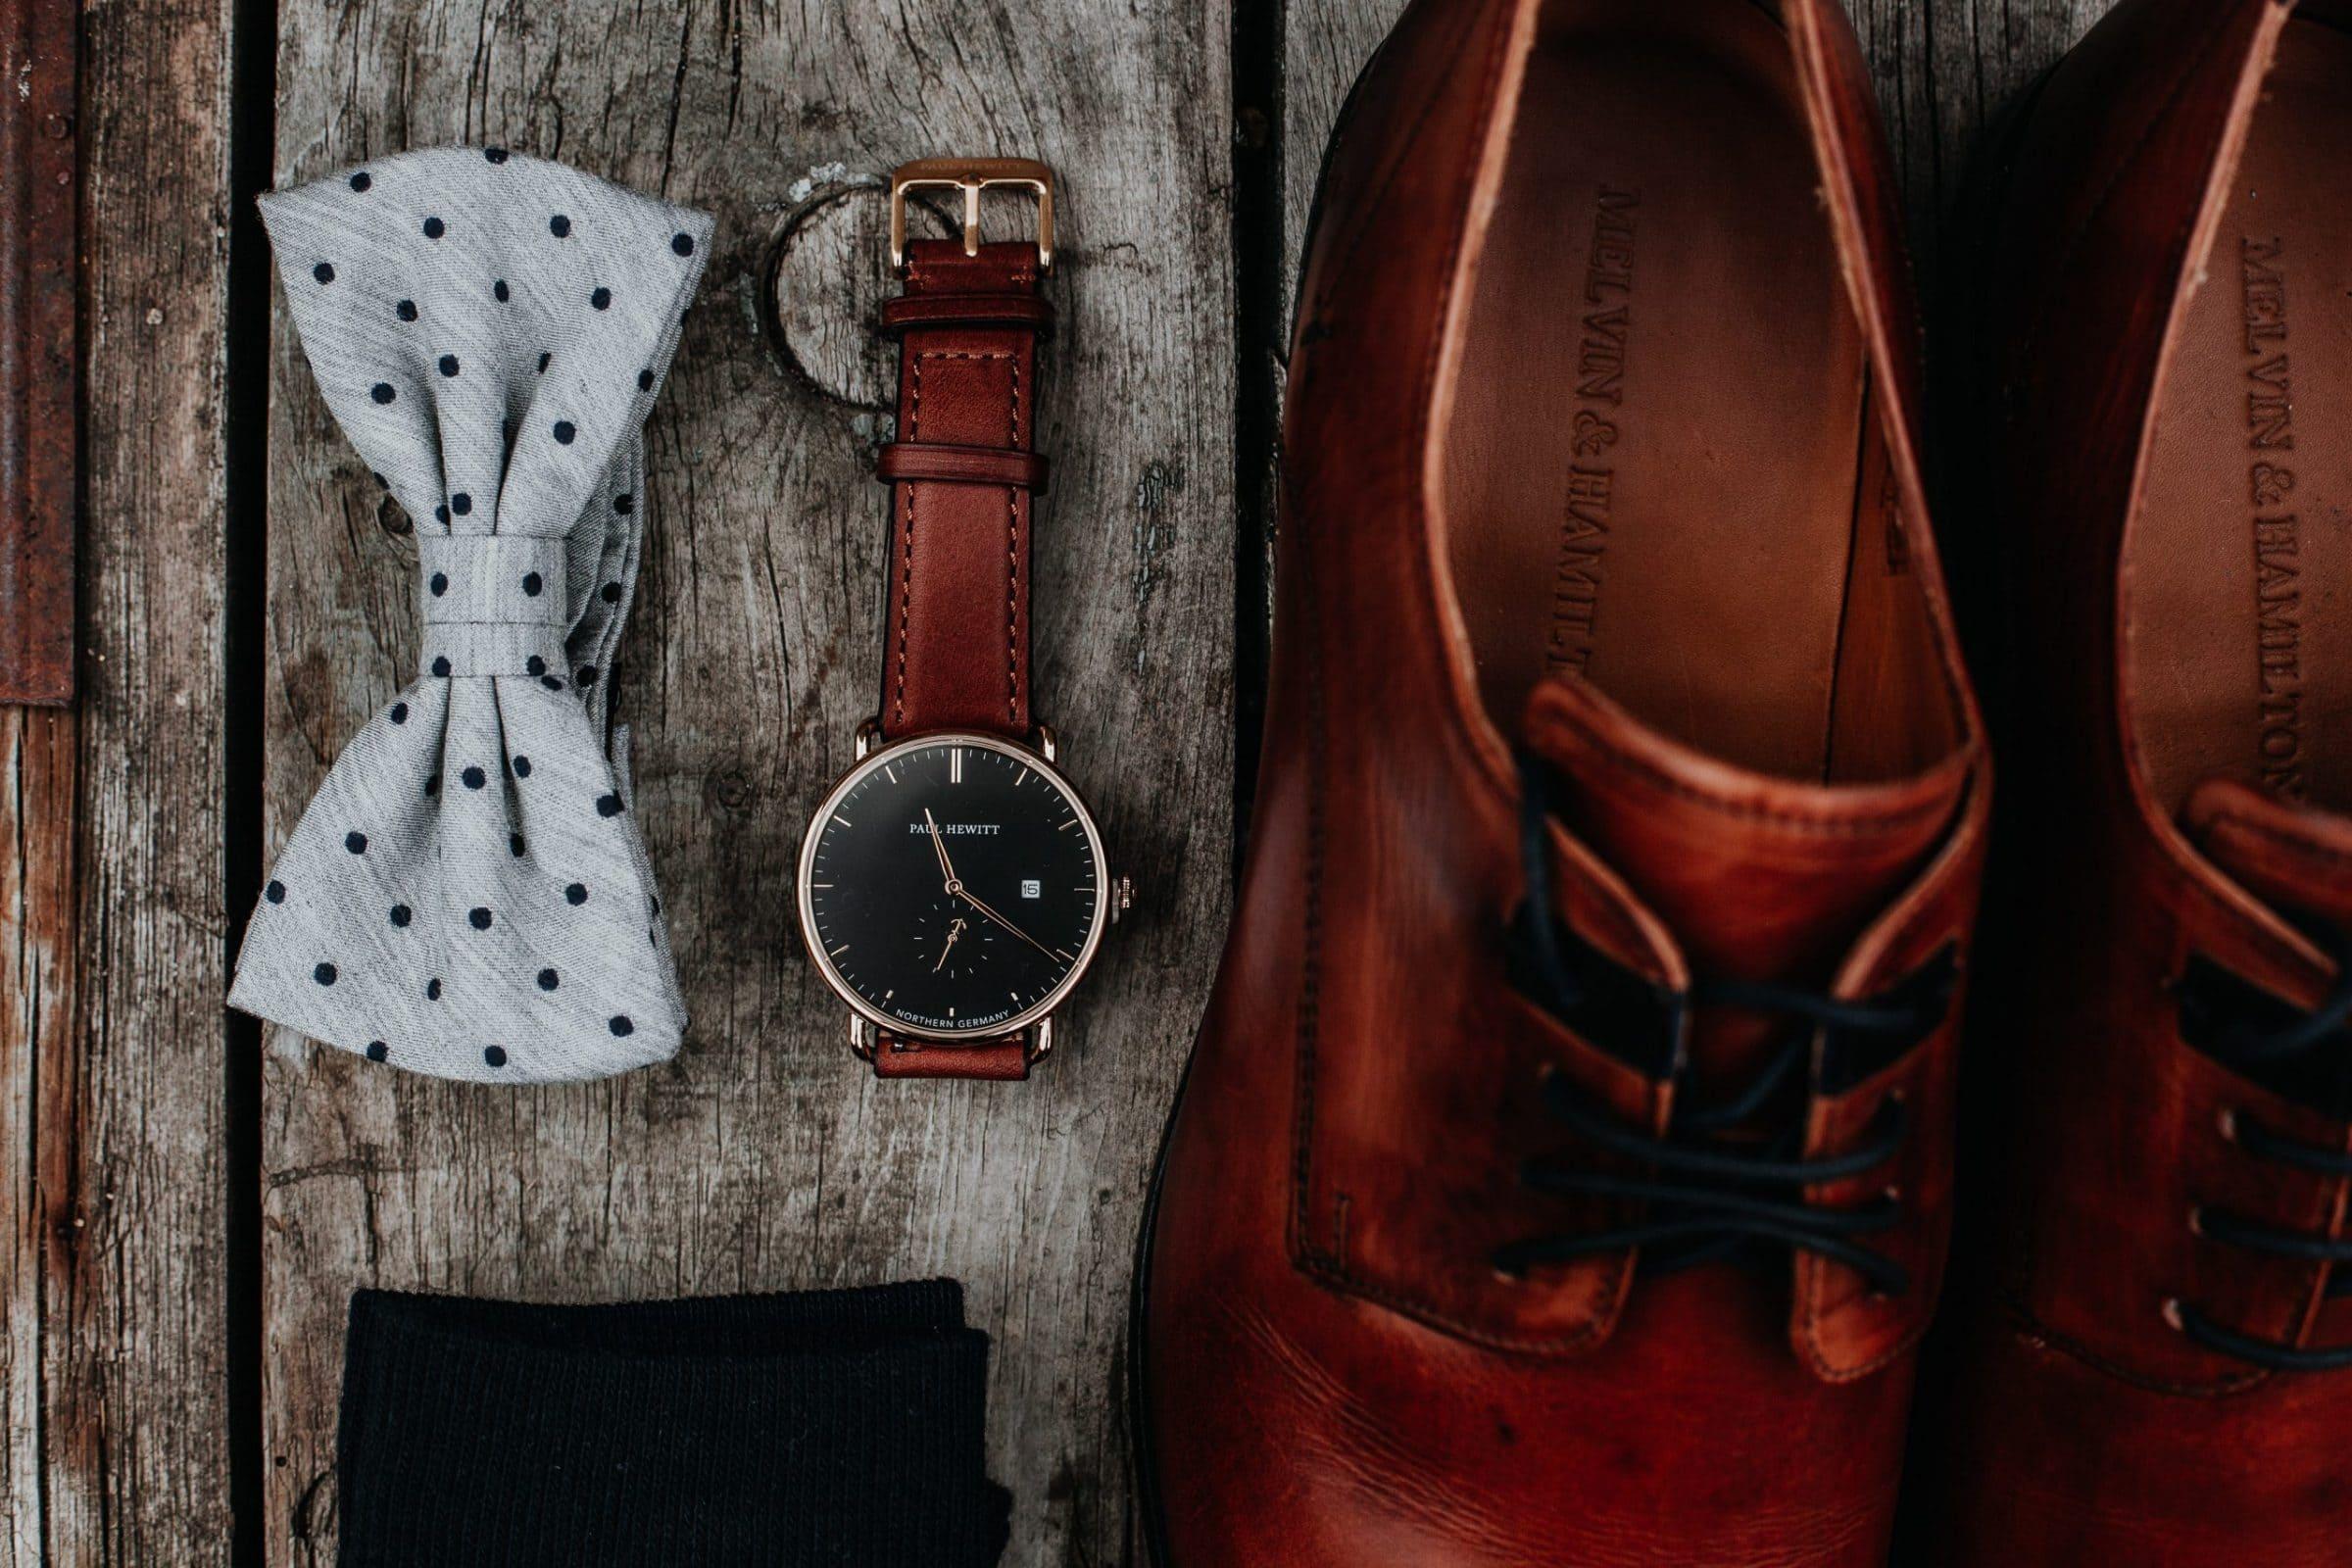 groom, accessoires groom, shoes, watch, bow tie, fliege, schuhe, uhr, socken, socks